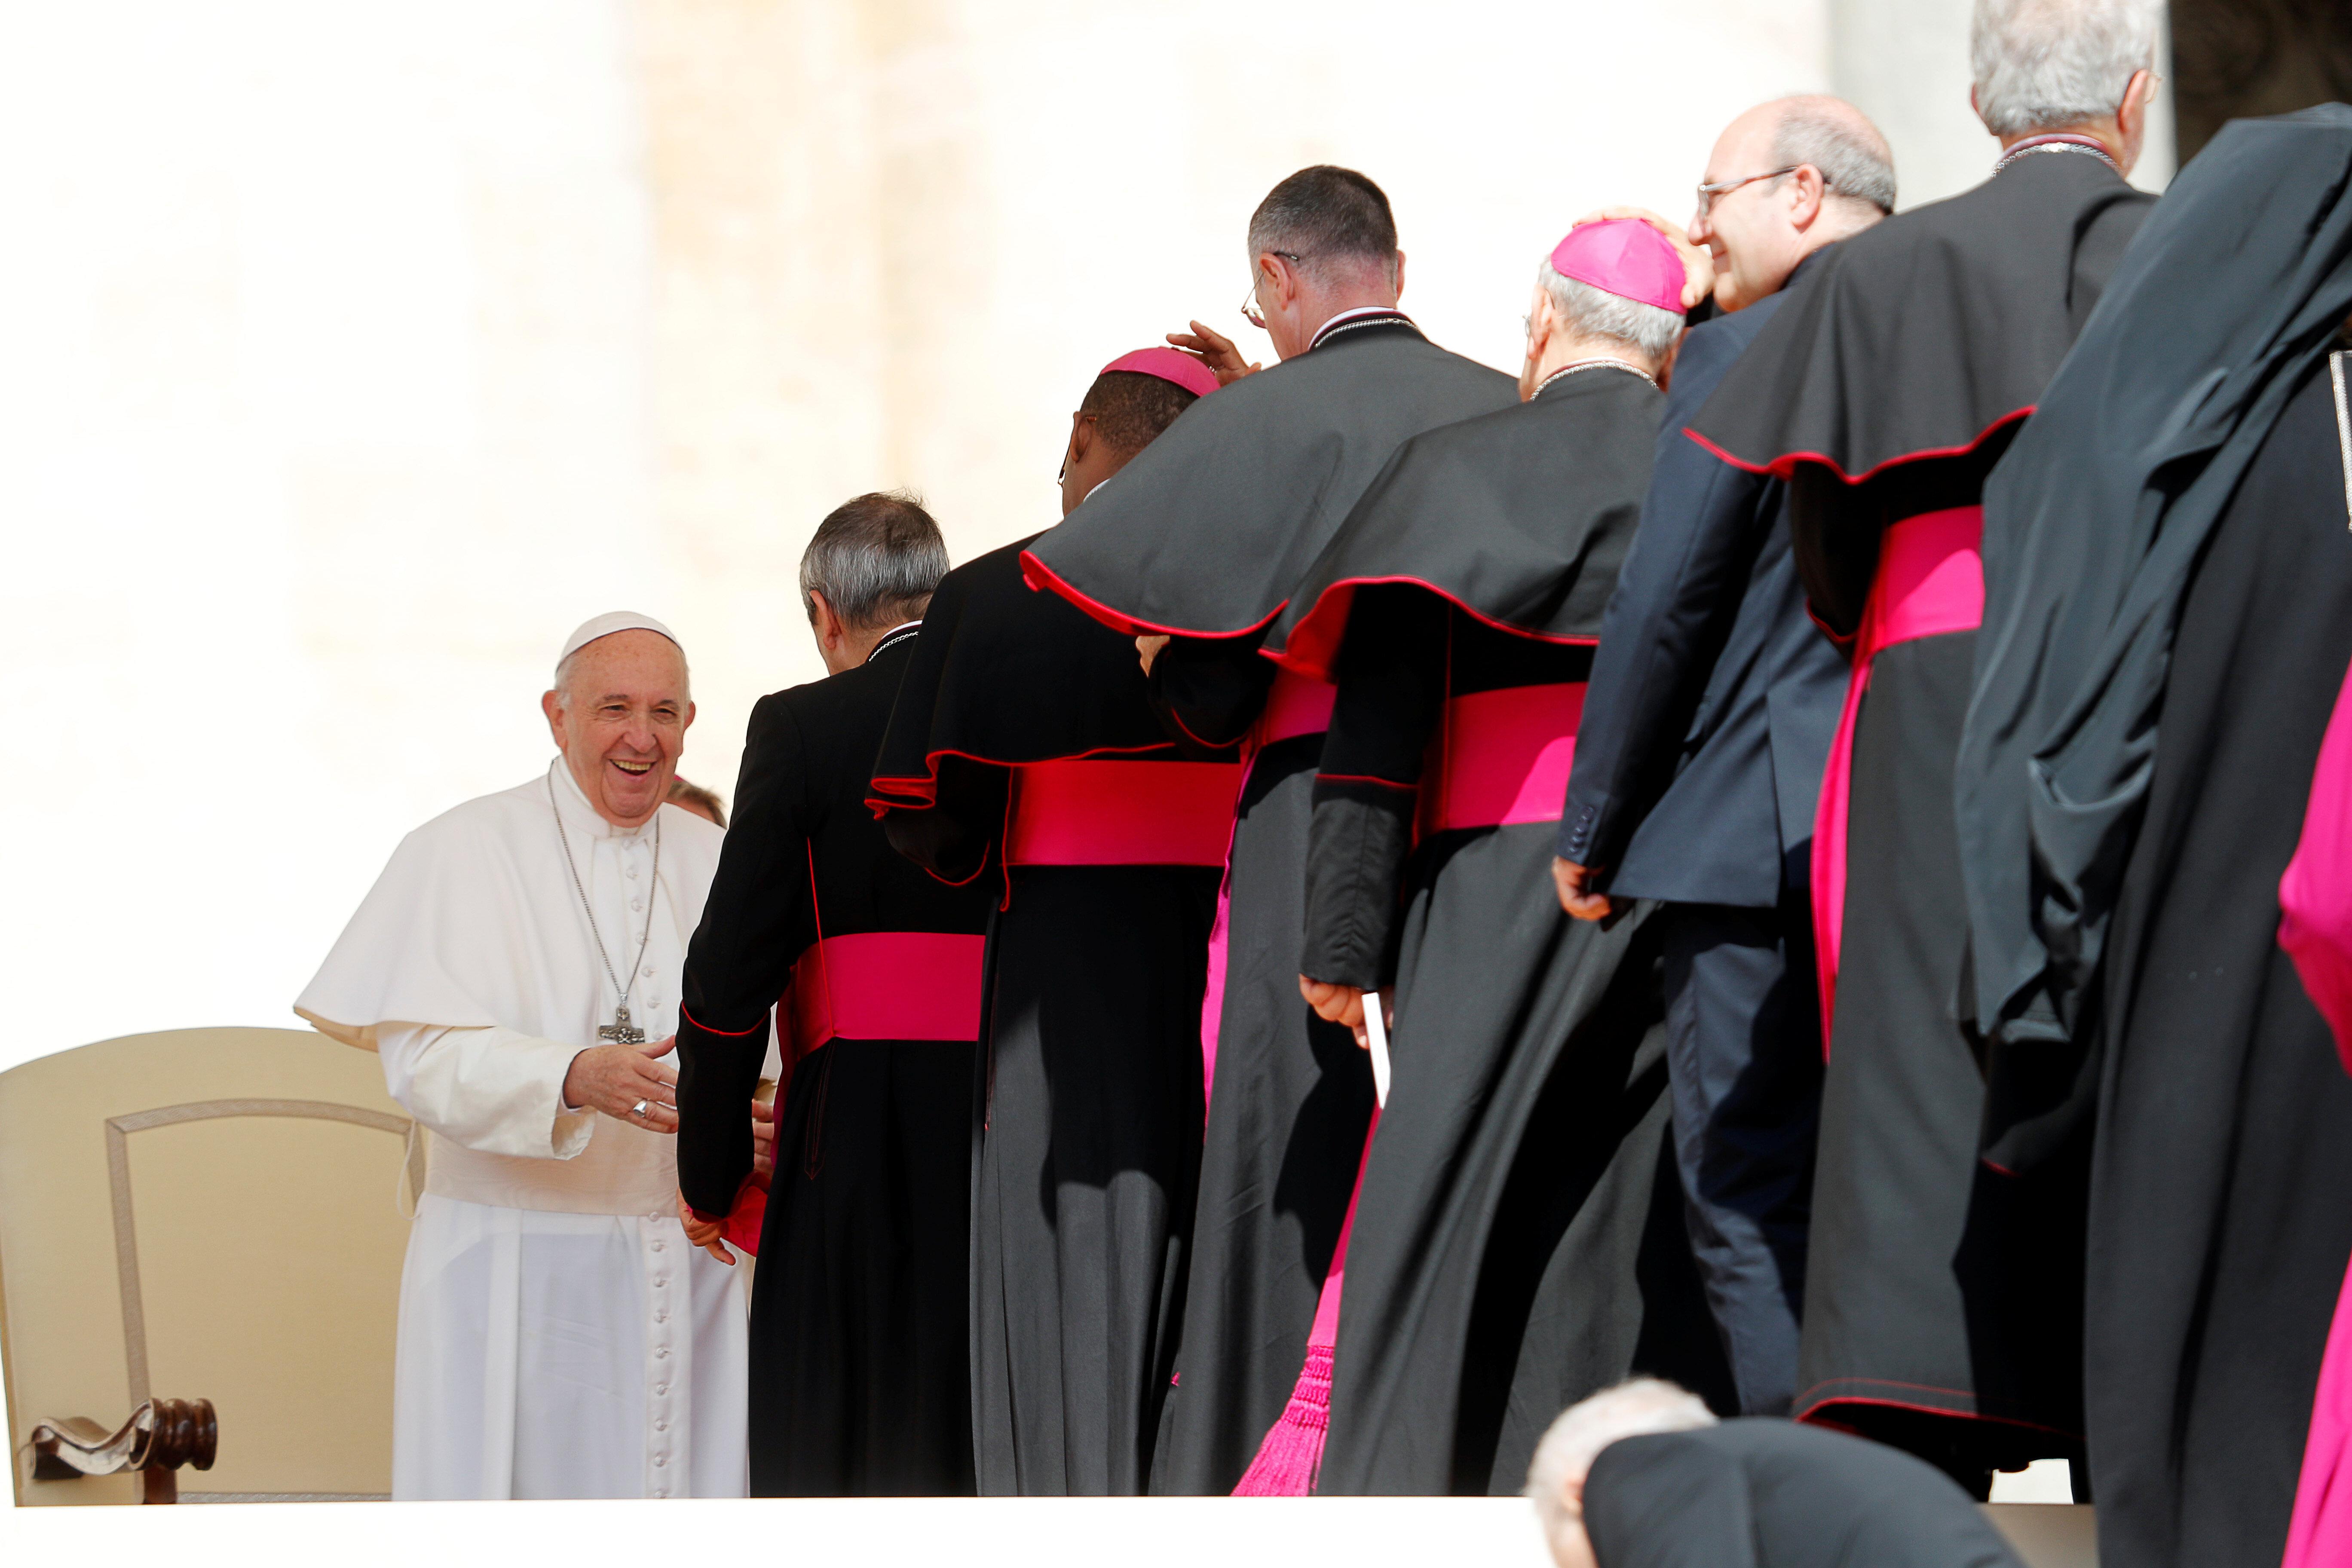 Appello al voto dei vescovi europei: